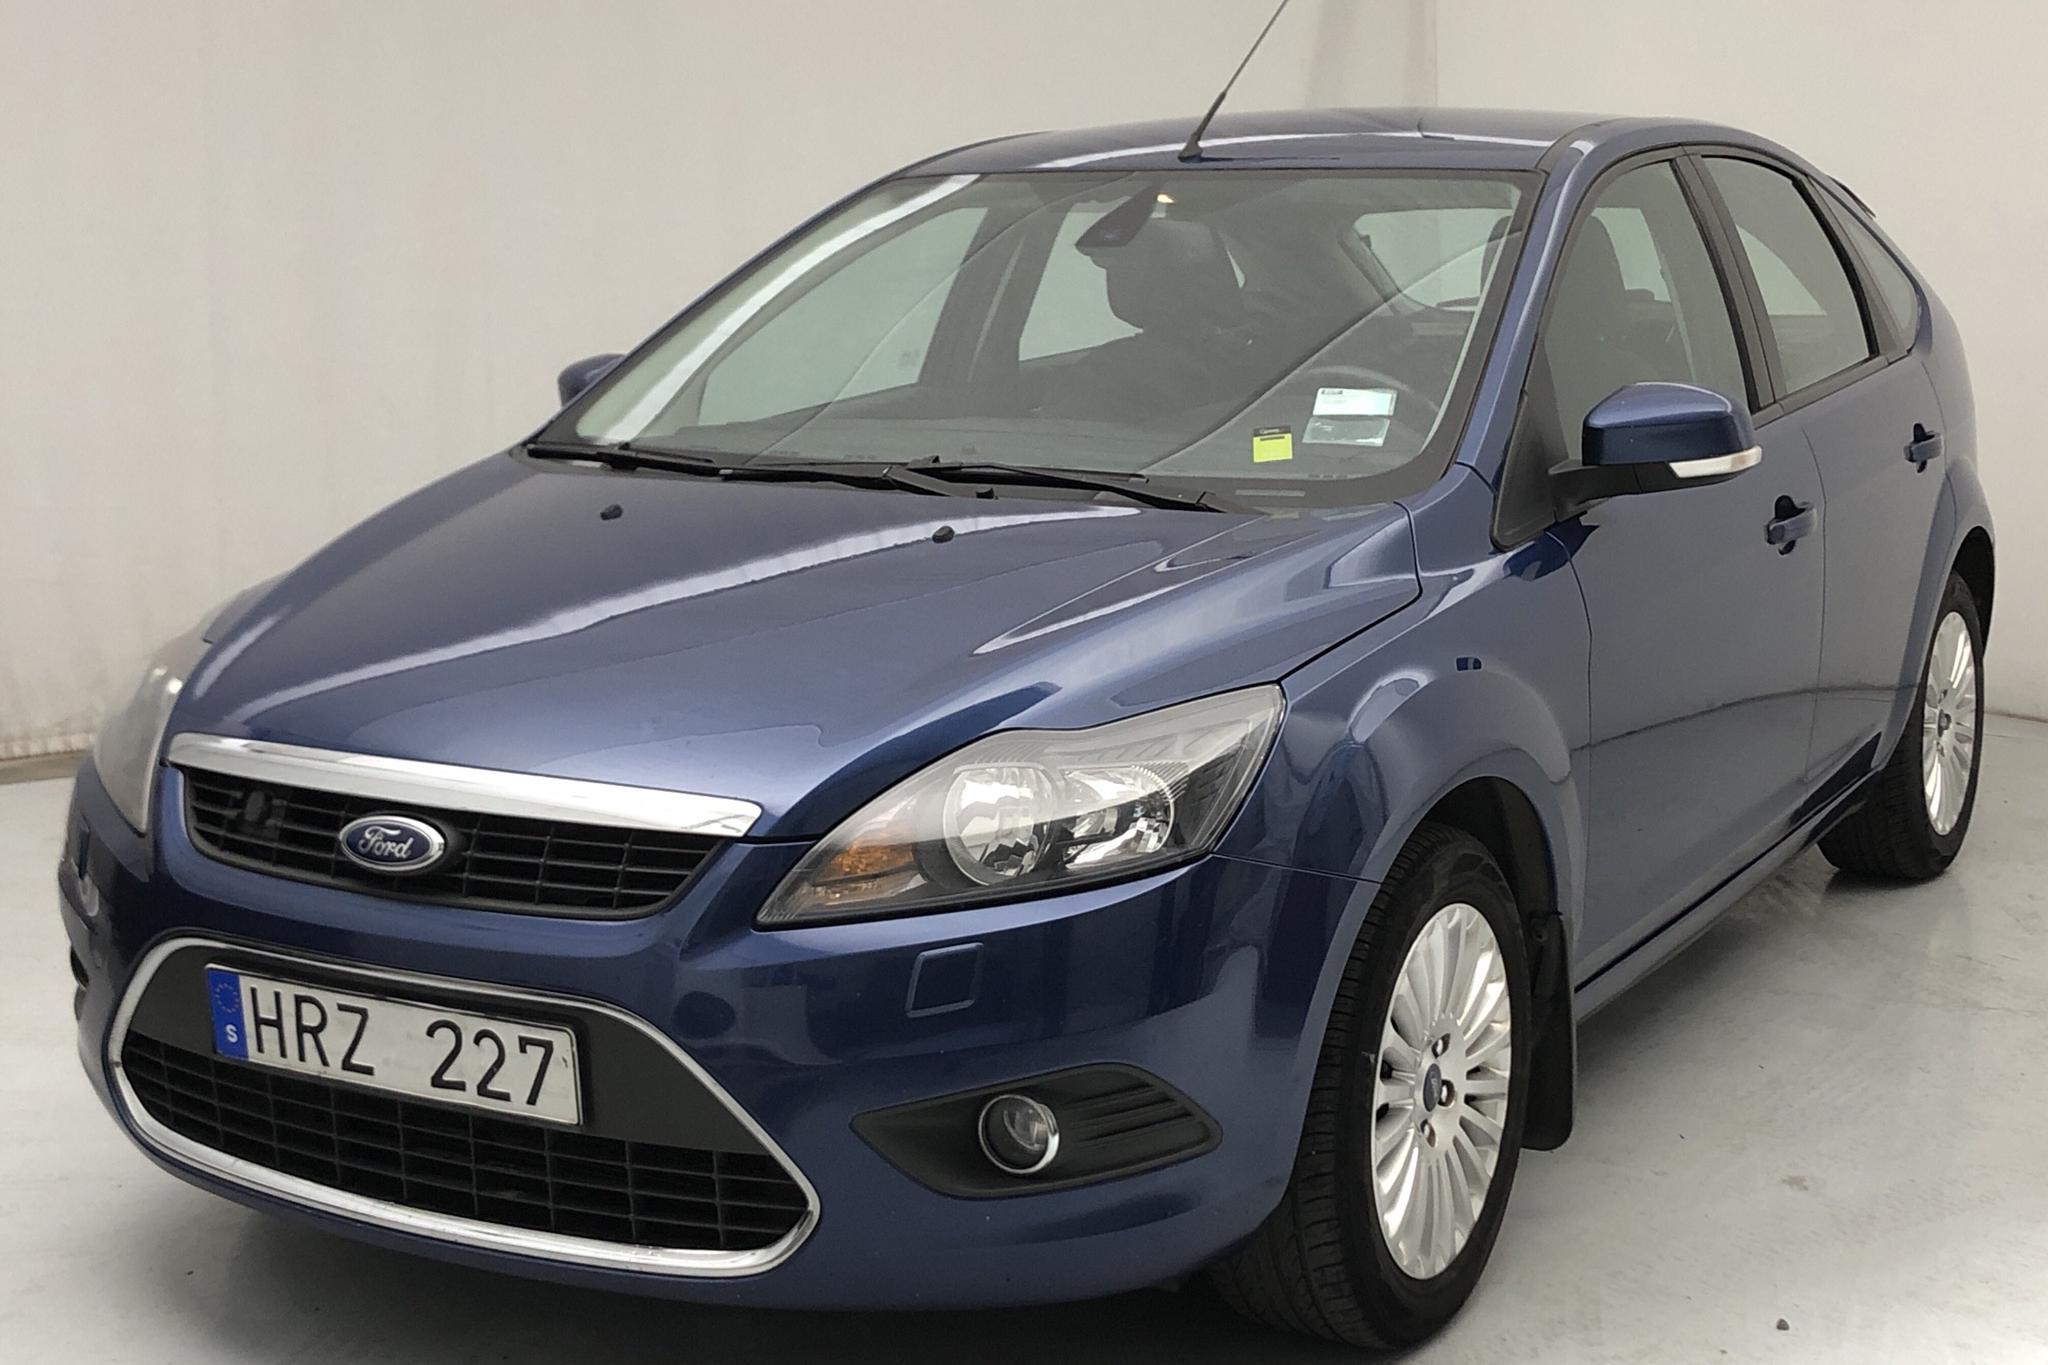 Ford Focus 1.8 Flexifuel 5dr (125hk)